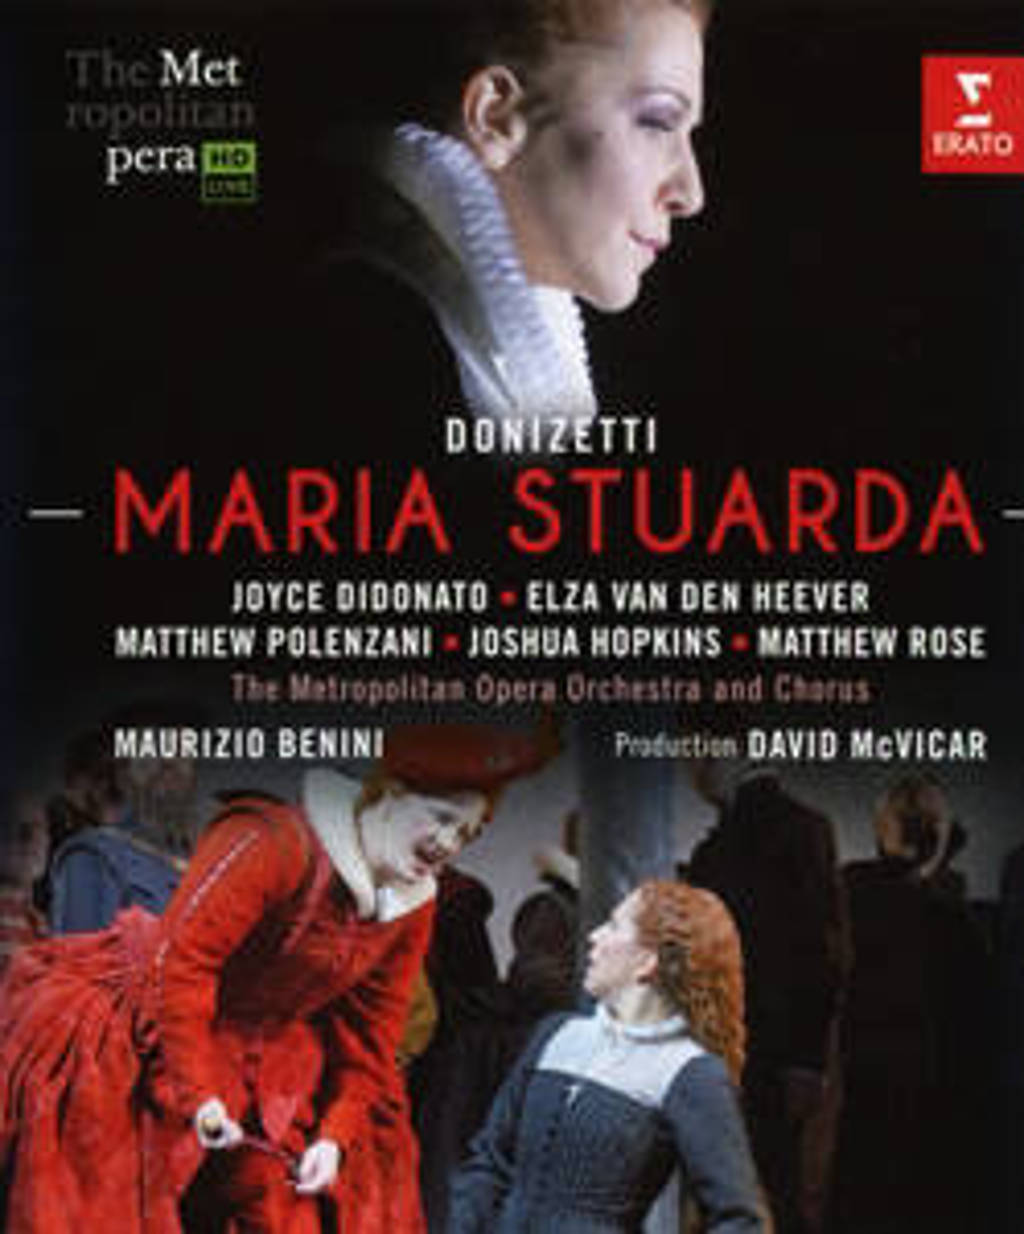 Joyce Didonato - Maria Stuarda (Blu-ray)